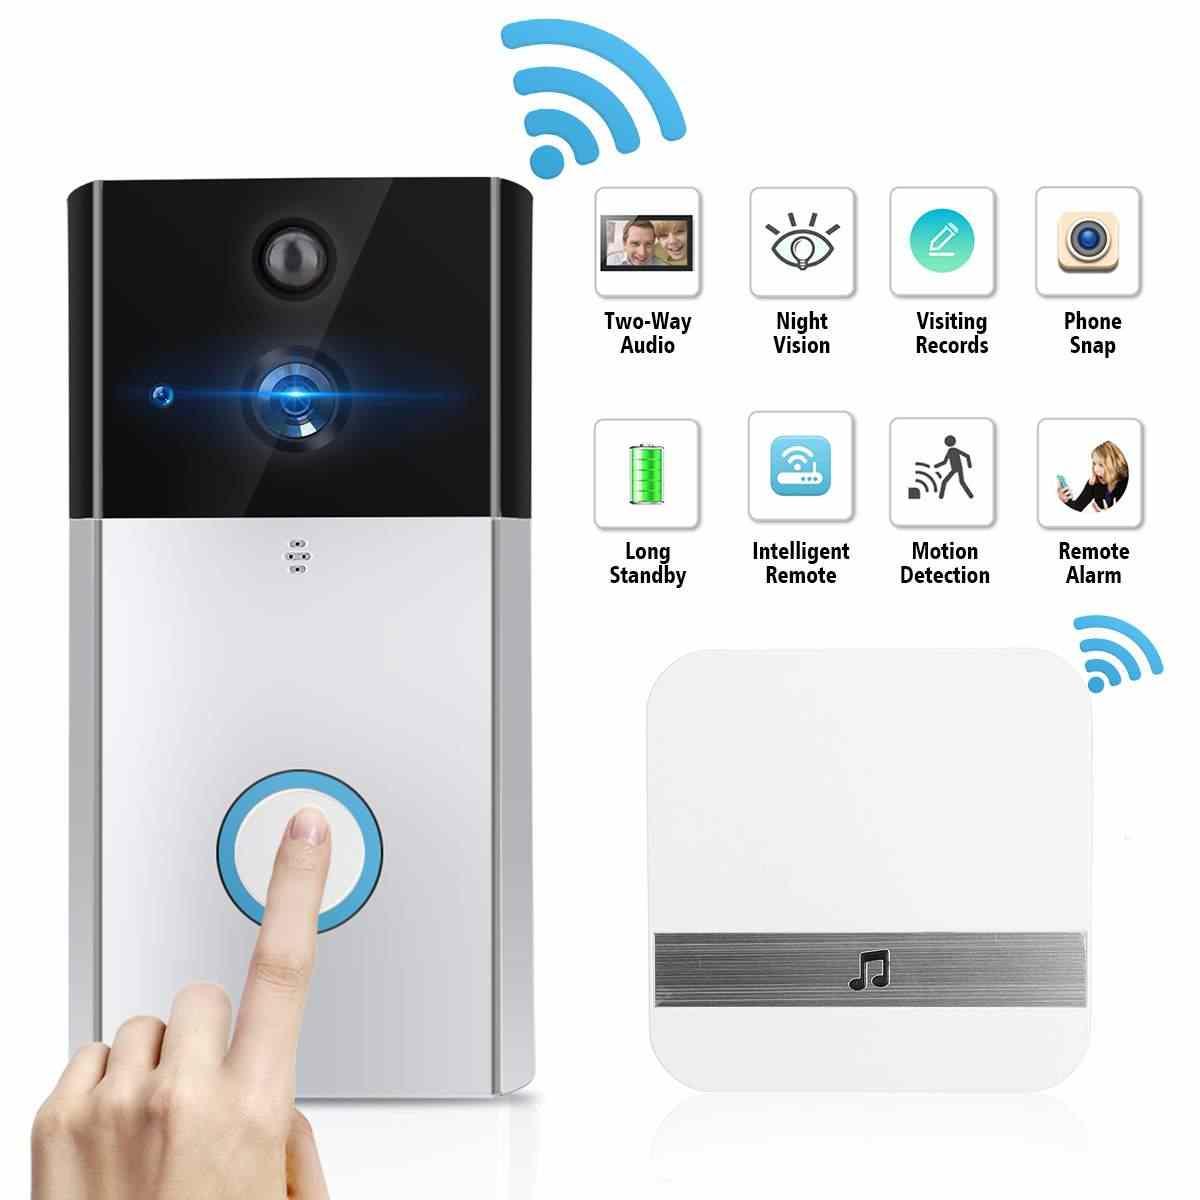 2b5fe9050150 Wireless Video DoorBell Camera 720P HD Smart Intercom Home Security Ring  WiFi Remote Phone DoorBell for